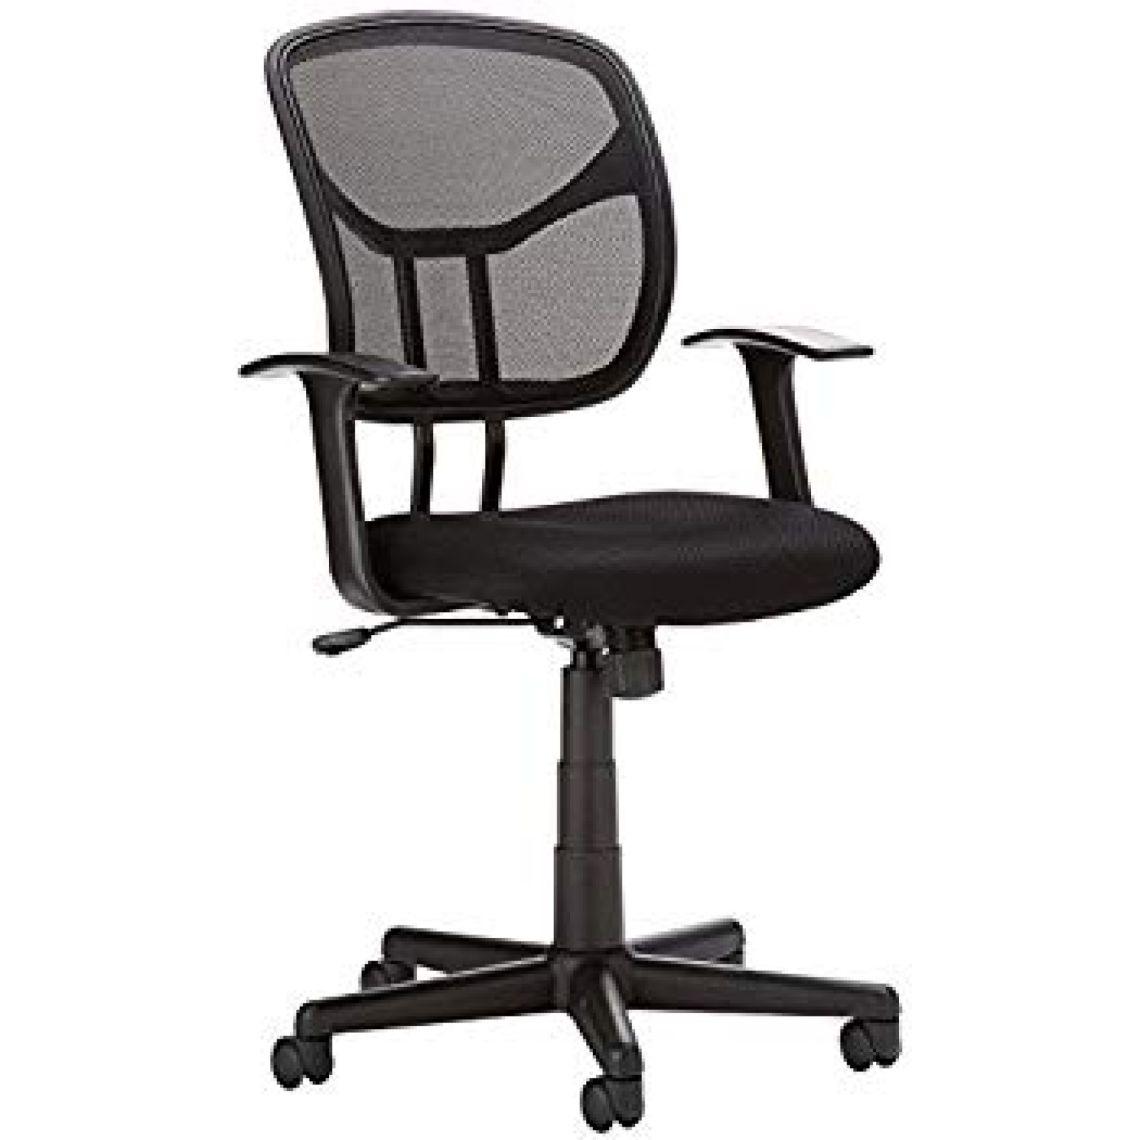 Amazon.com: AmazonBasics Mid-Back Black Mesh Chair: Kitchen & Dining